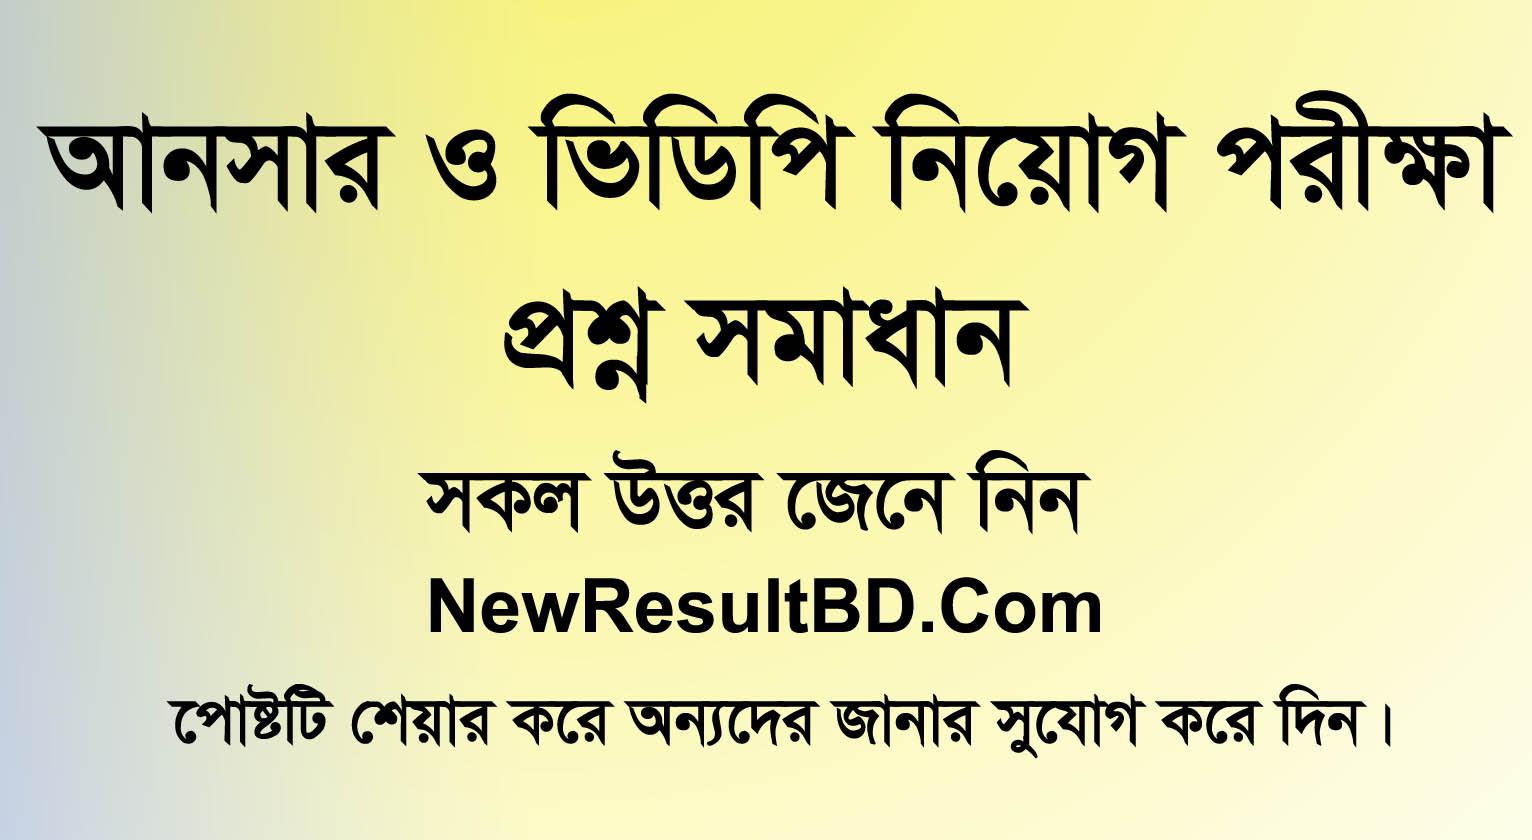 Ansar VDP question solution